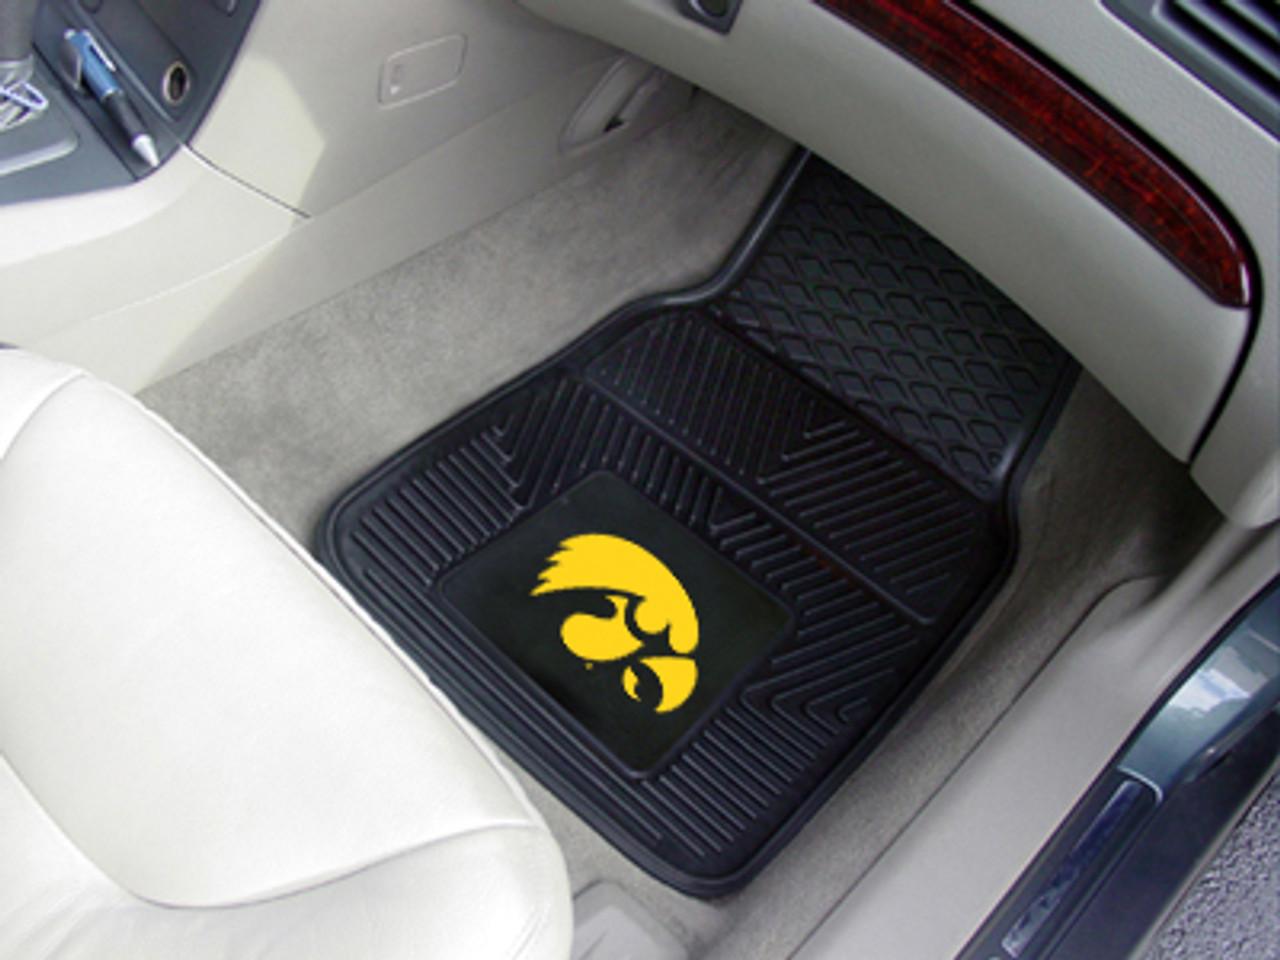 University of Illinois Heavy Duty Vinyl Car Floor Mats Set of 2